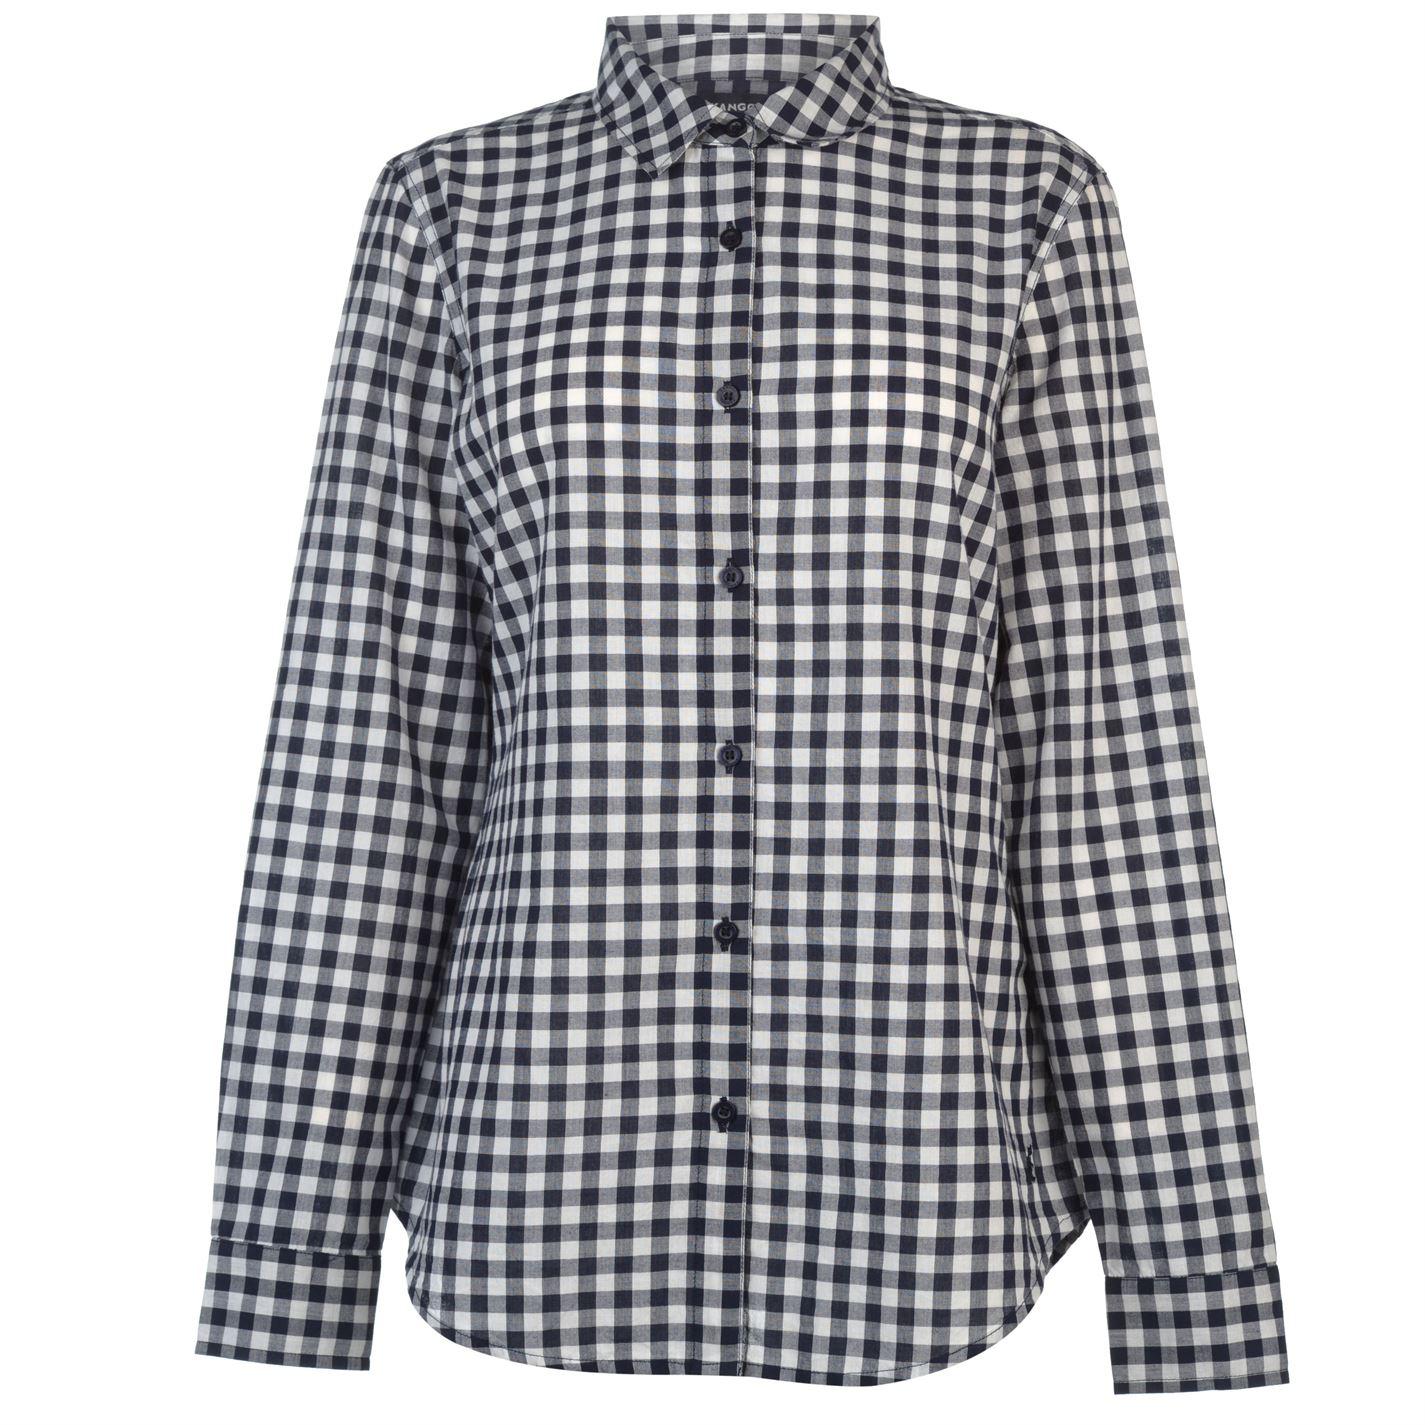 Kangol Long Sleeve Check Shirt dámske